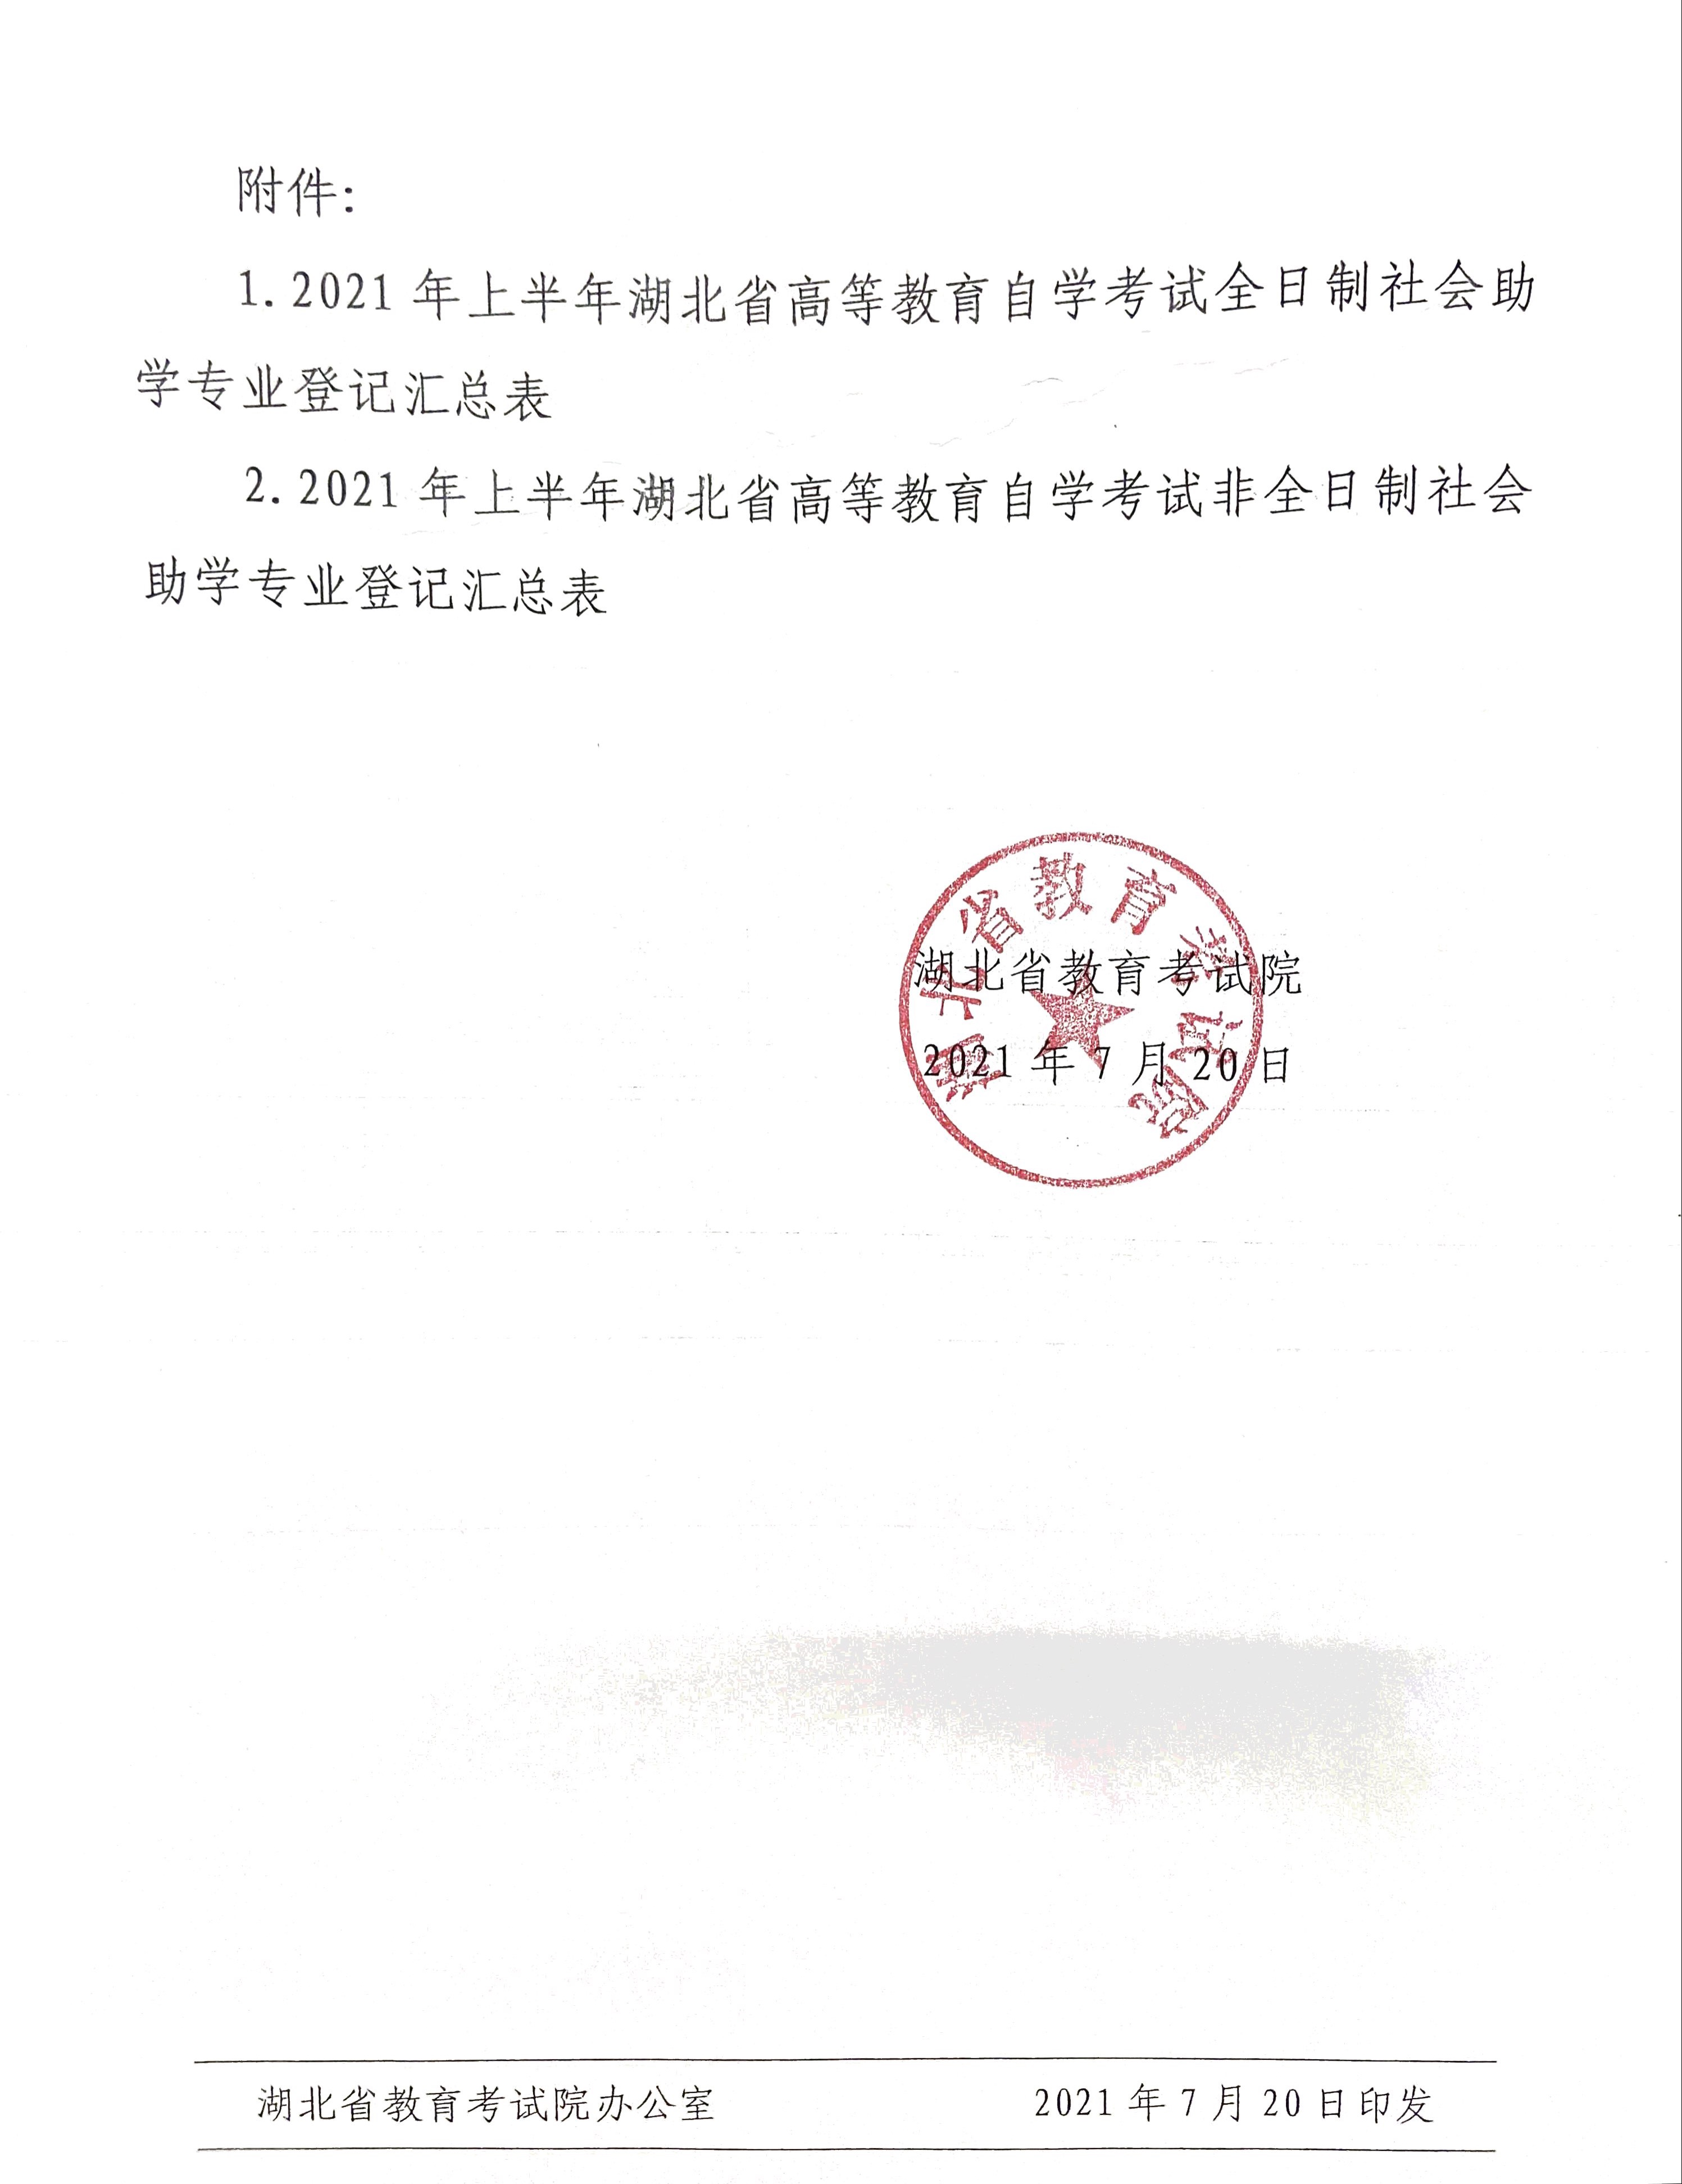 IMG_0822(20210721-114108)